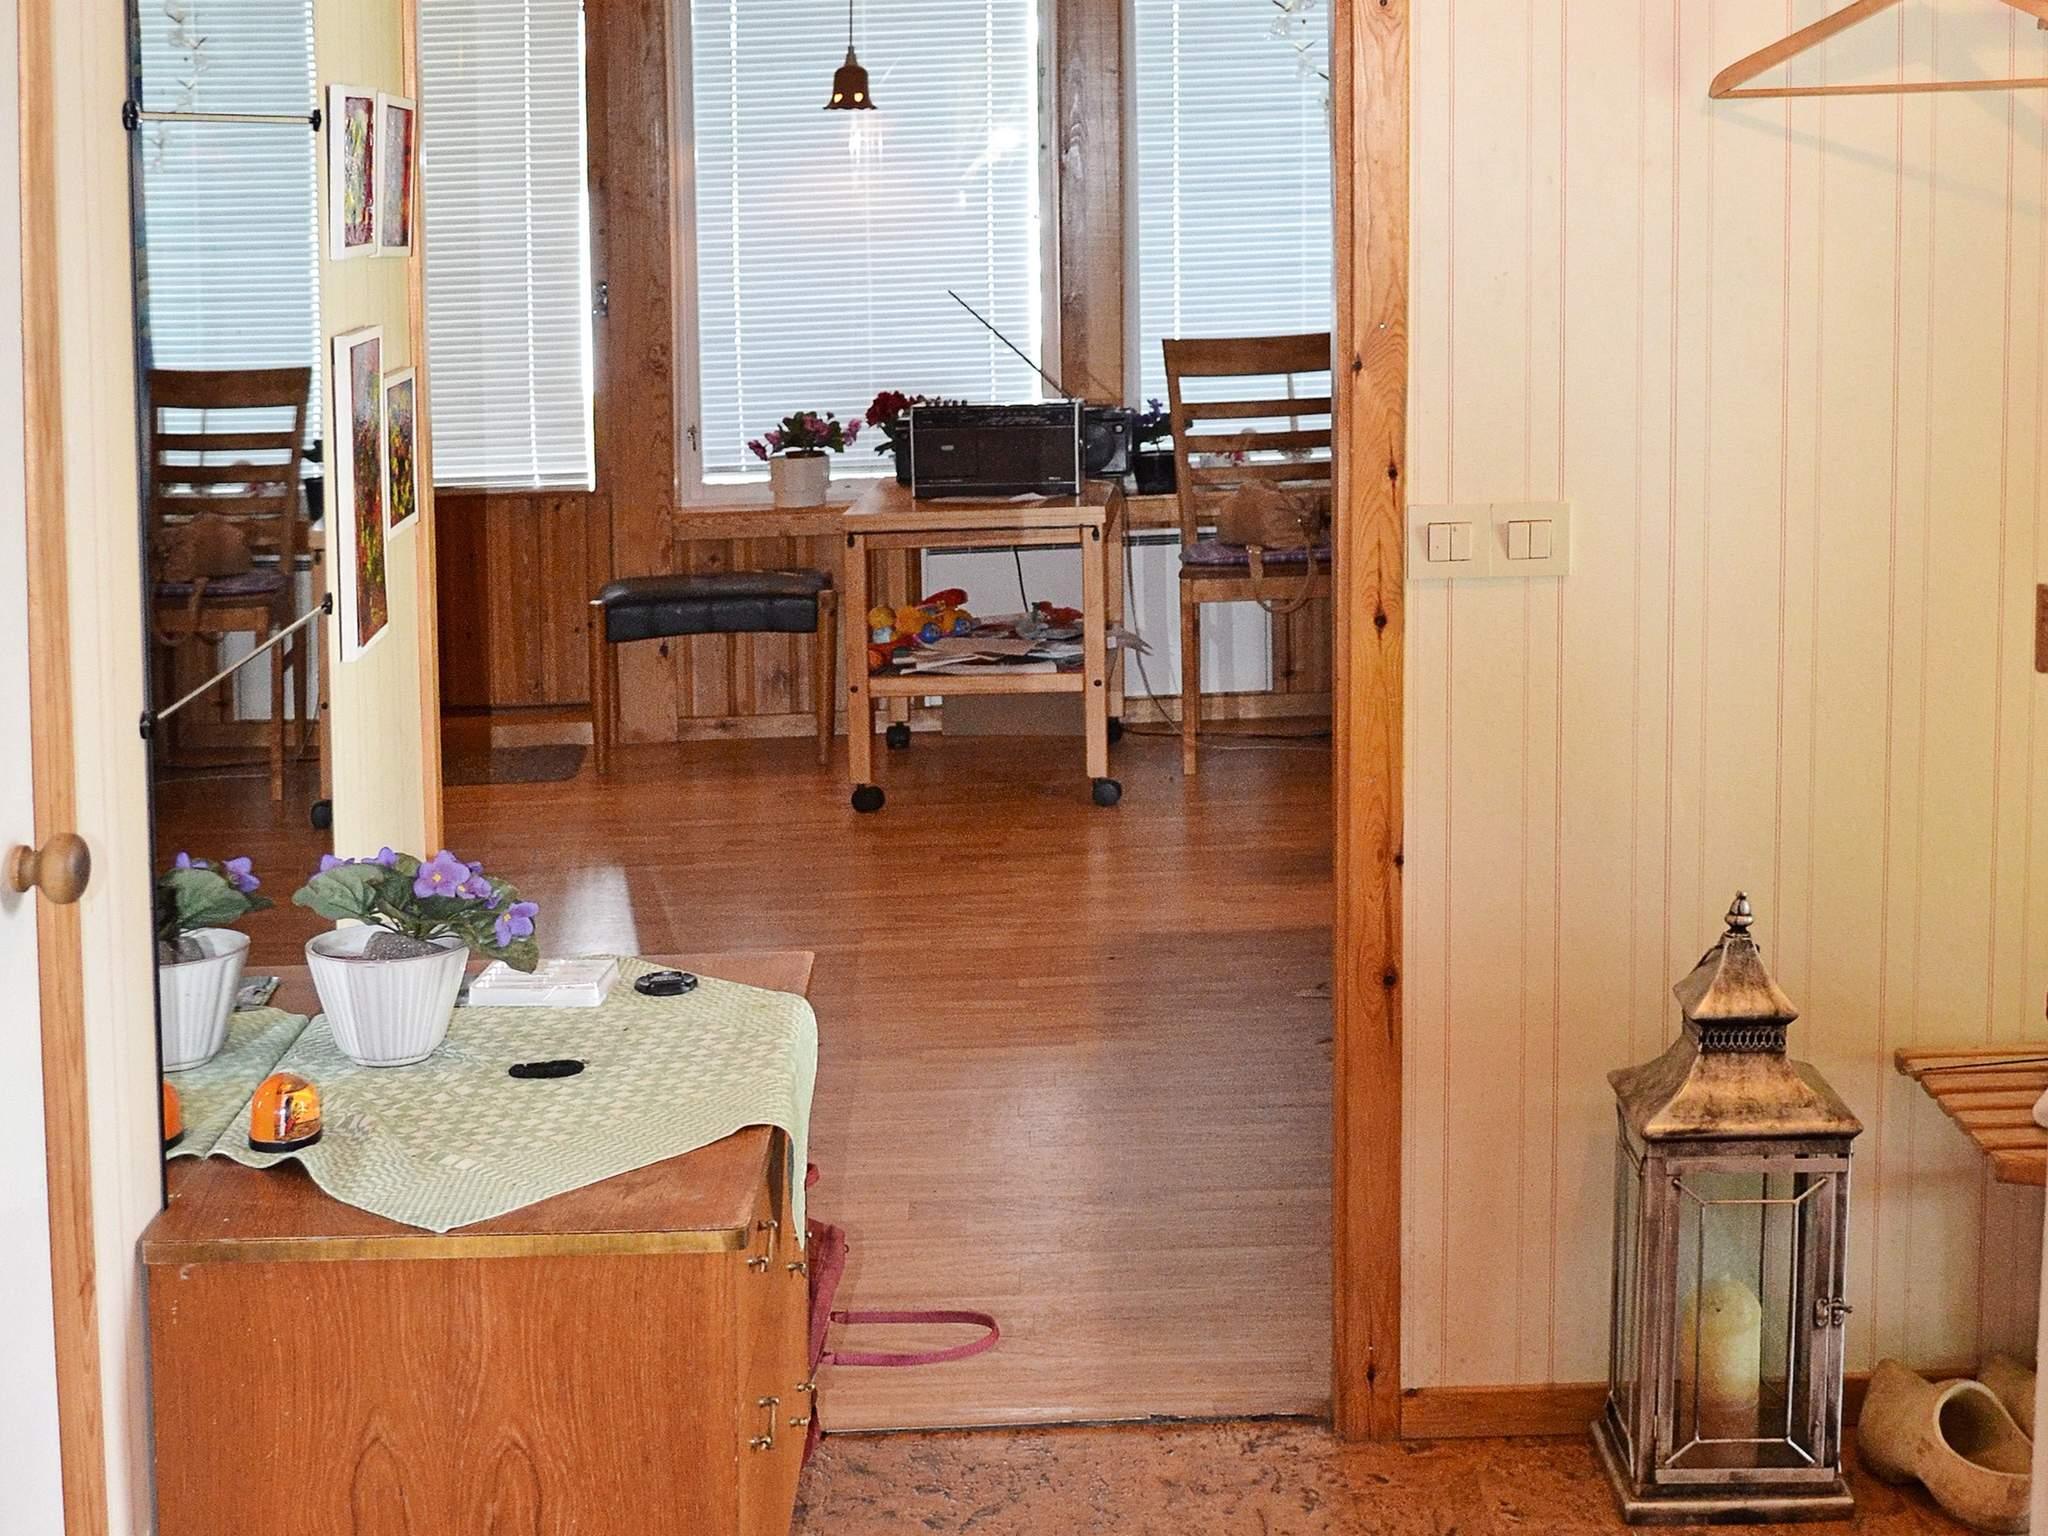 Ferienhaus Nordmaling (1026050), Lögdeå, Västerbottens län, Nordschweden, Schweden, Bild 6